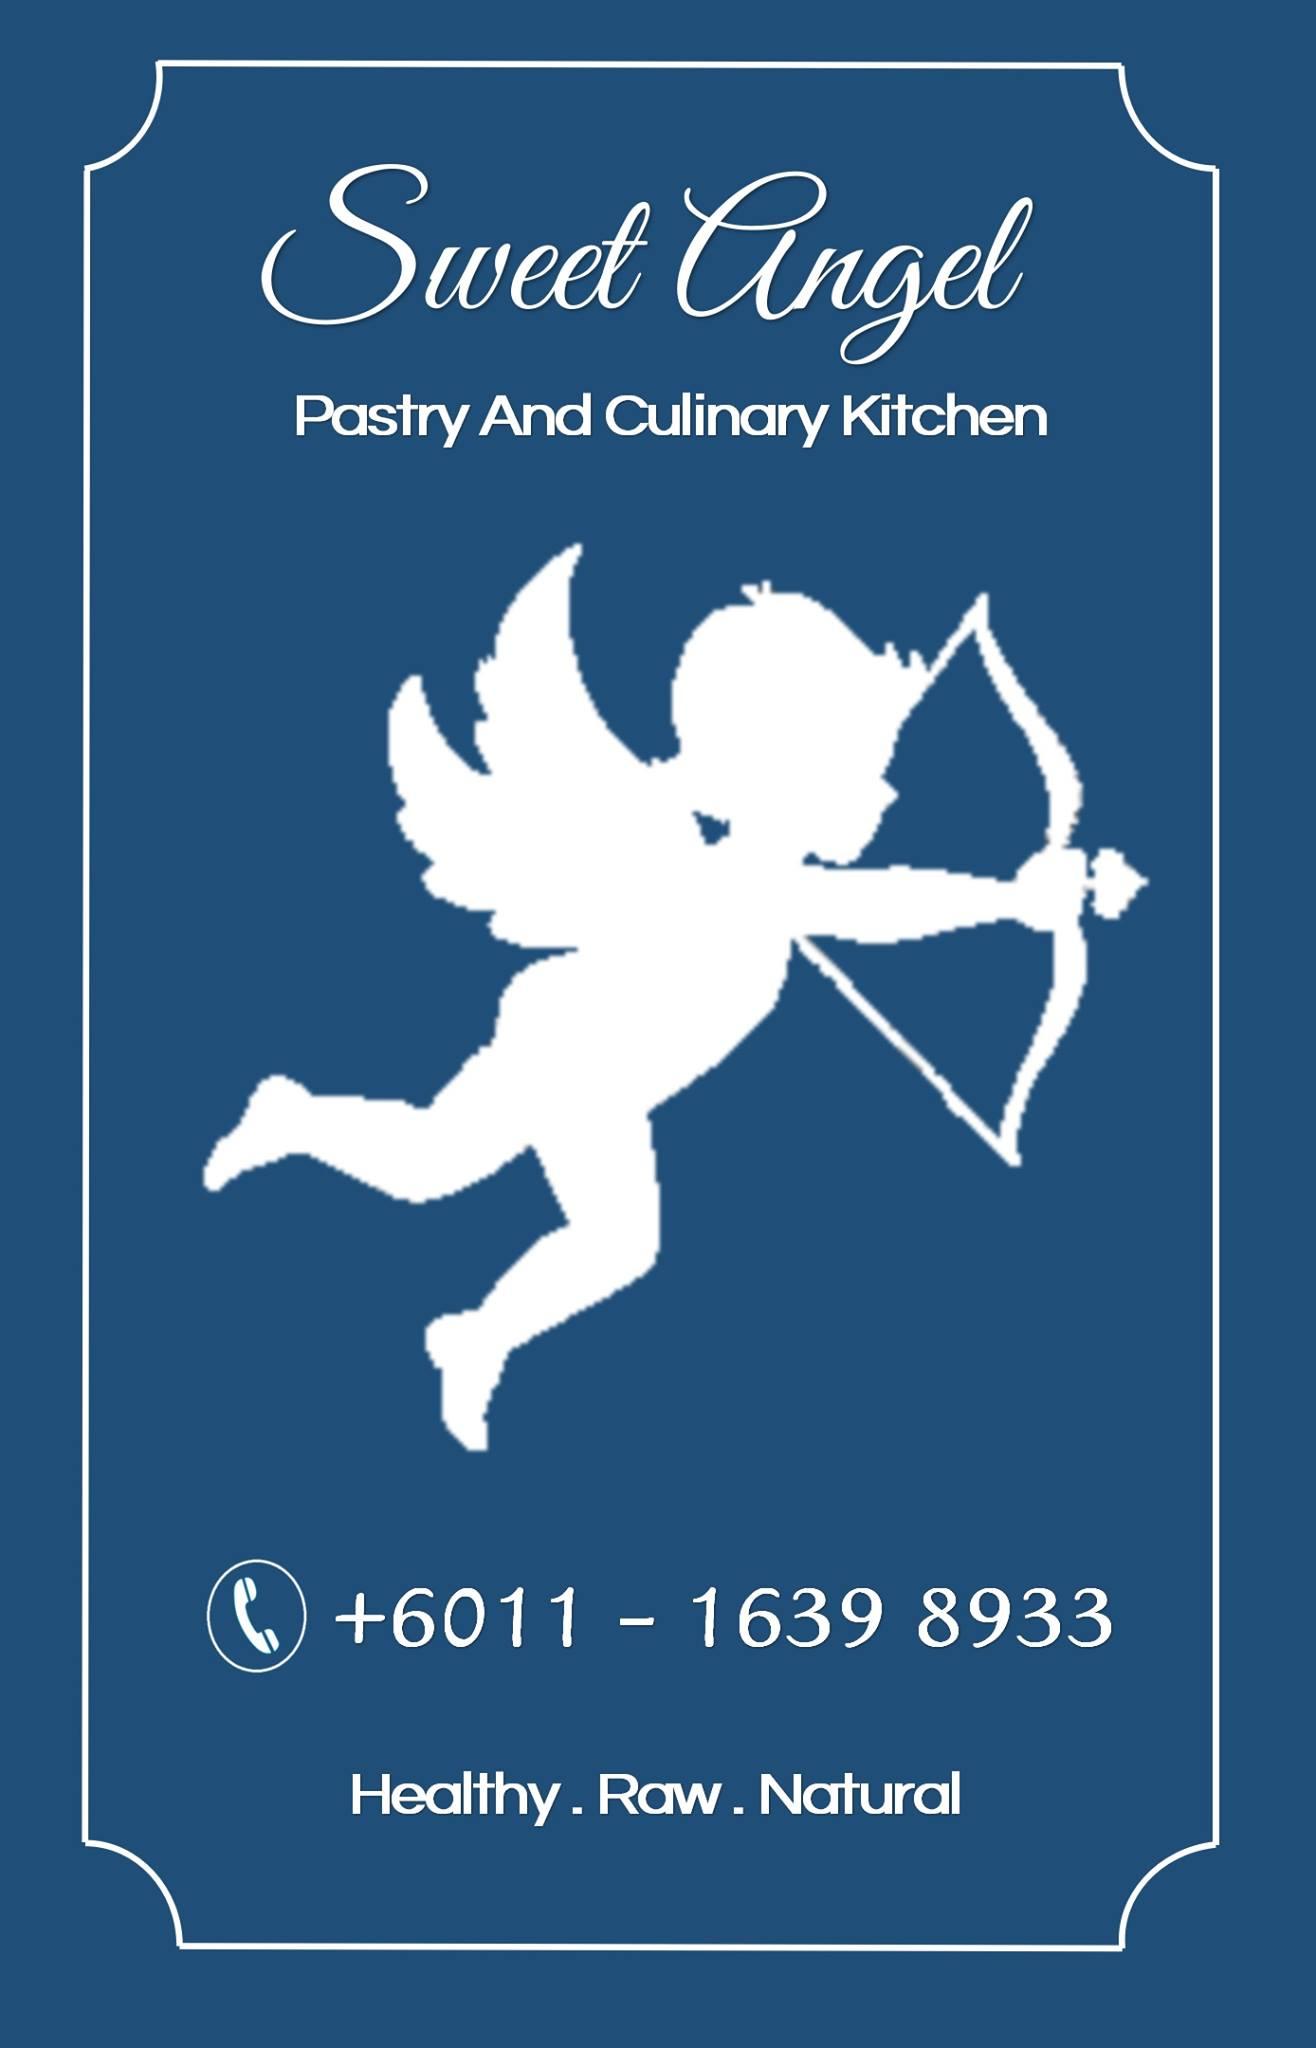 2.-Sweet-Angel-Pastry-Culiray-Kitchen